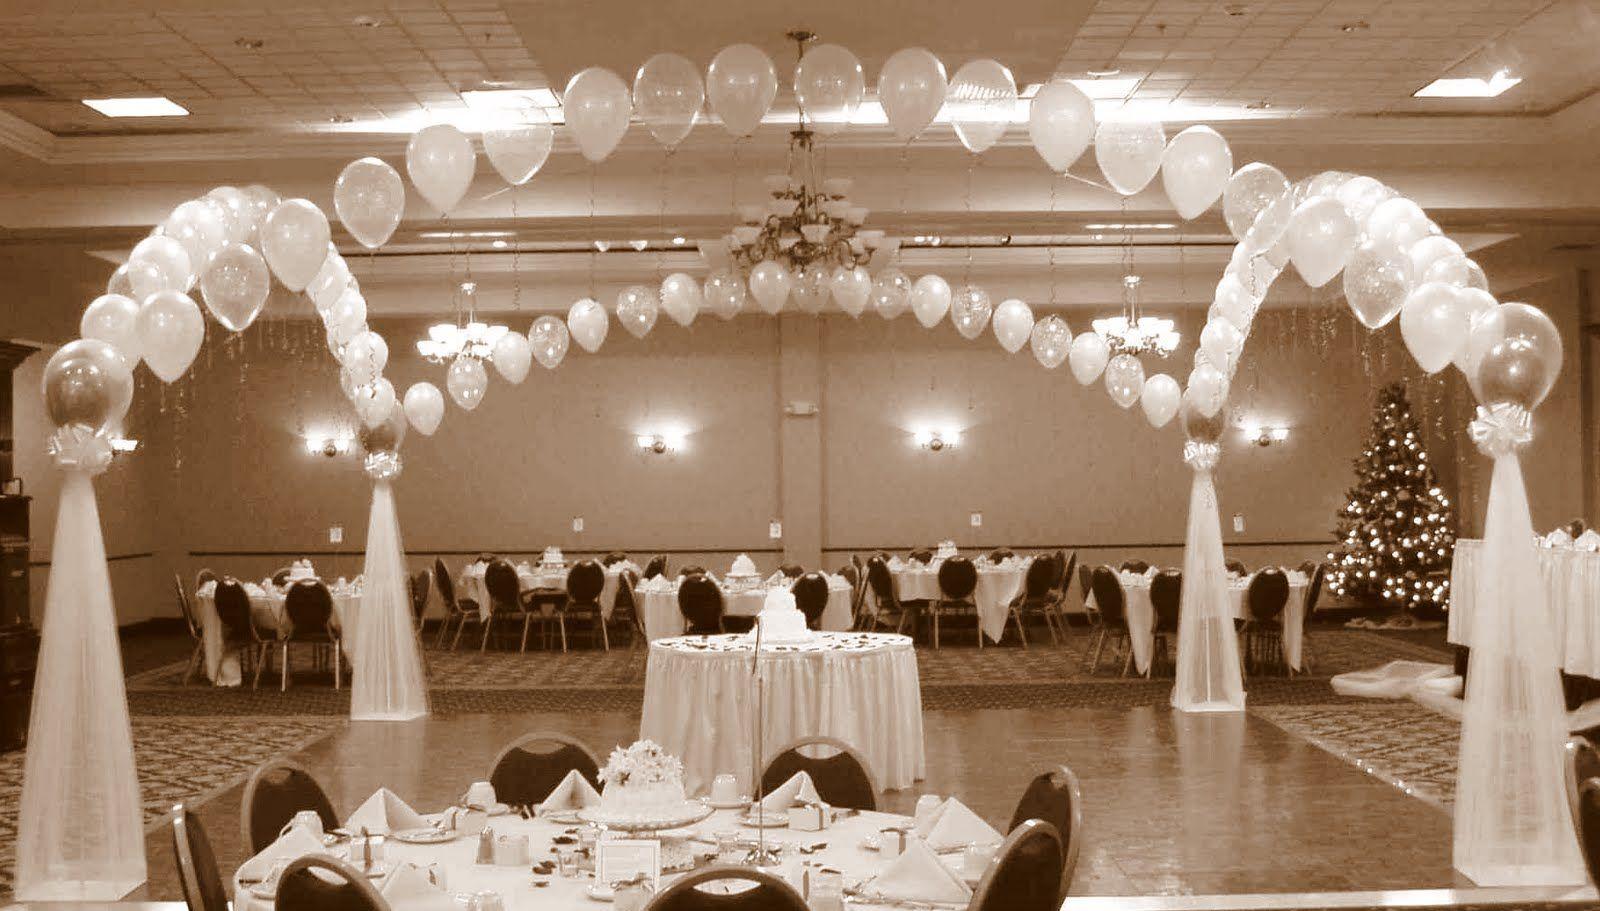 Wedding decorations for hall  Balloon Wedding Everlasting Decoration Idea  Wedding Decoration